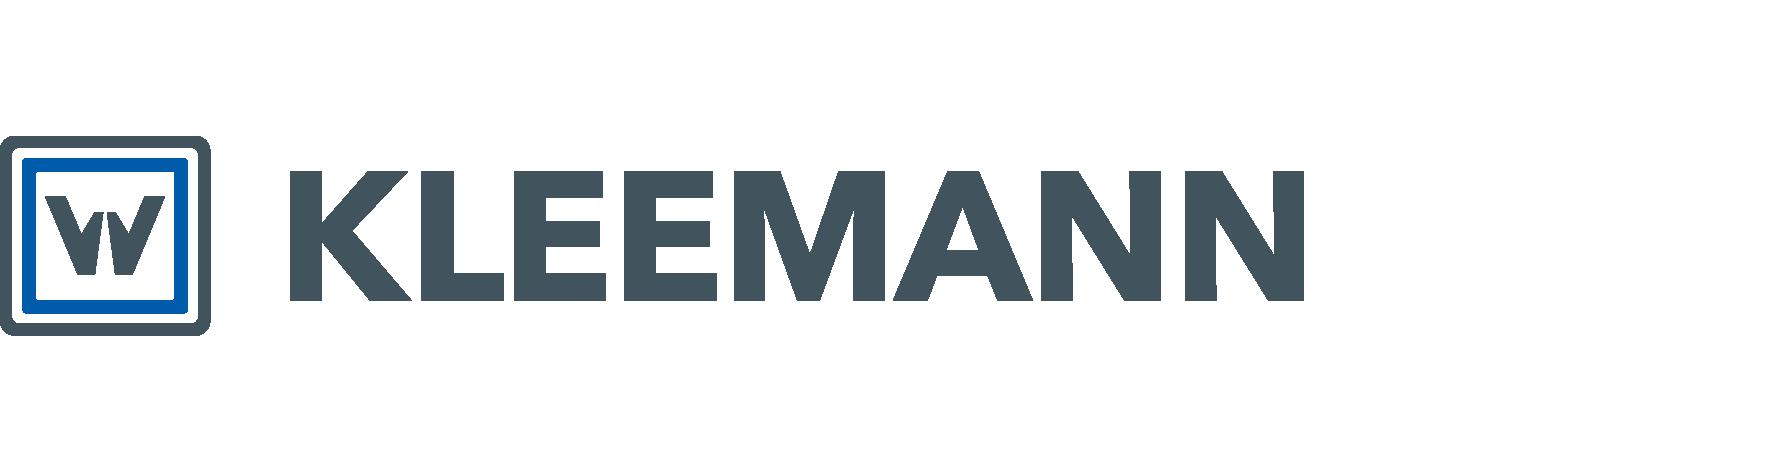 kleemann_left_cores